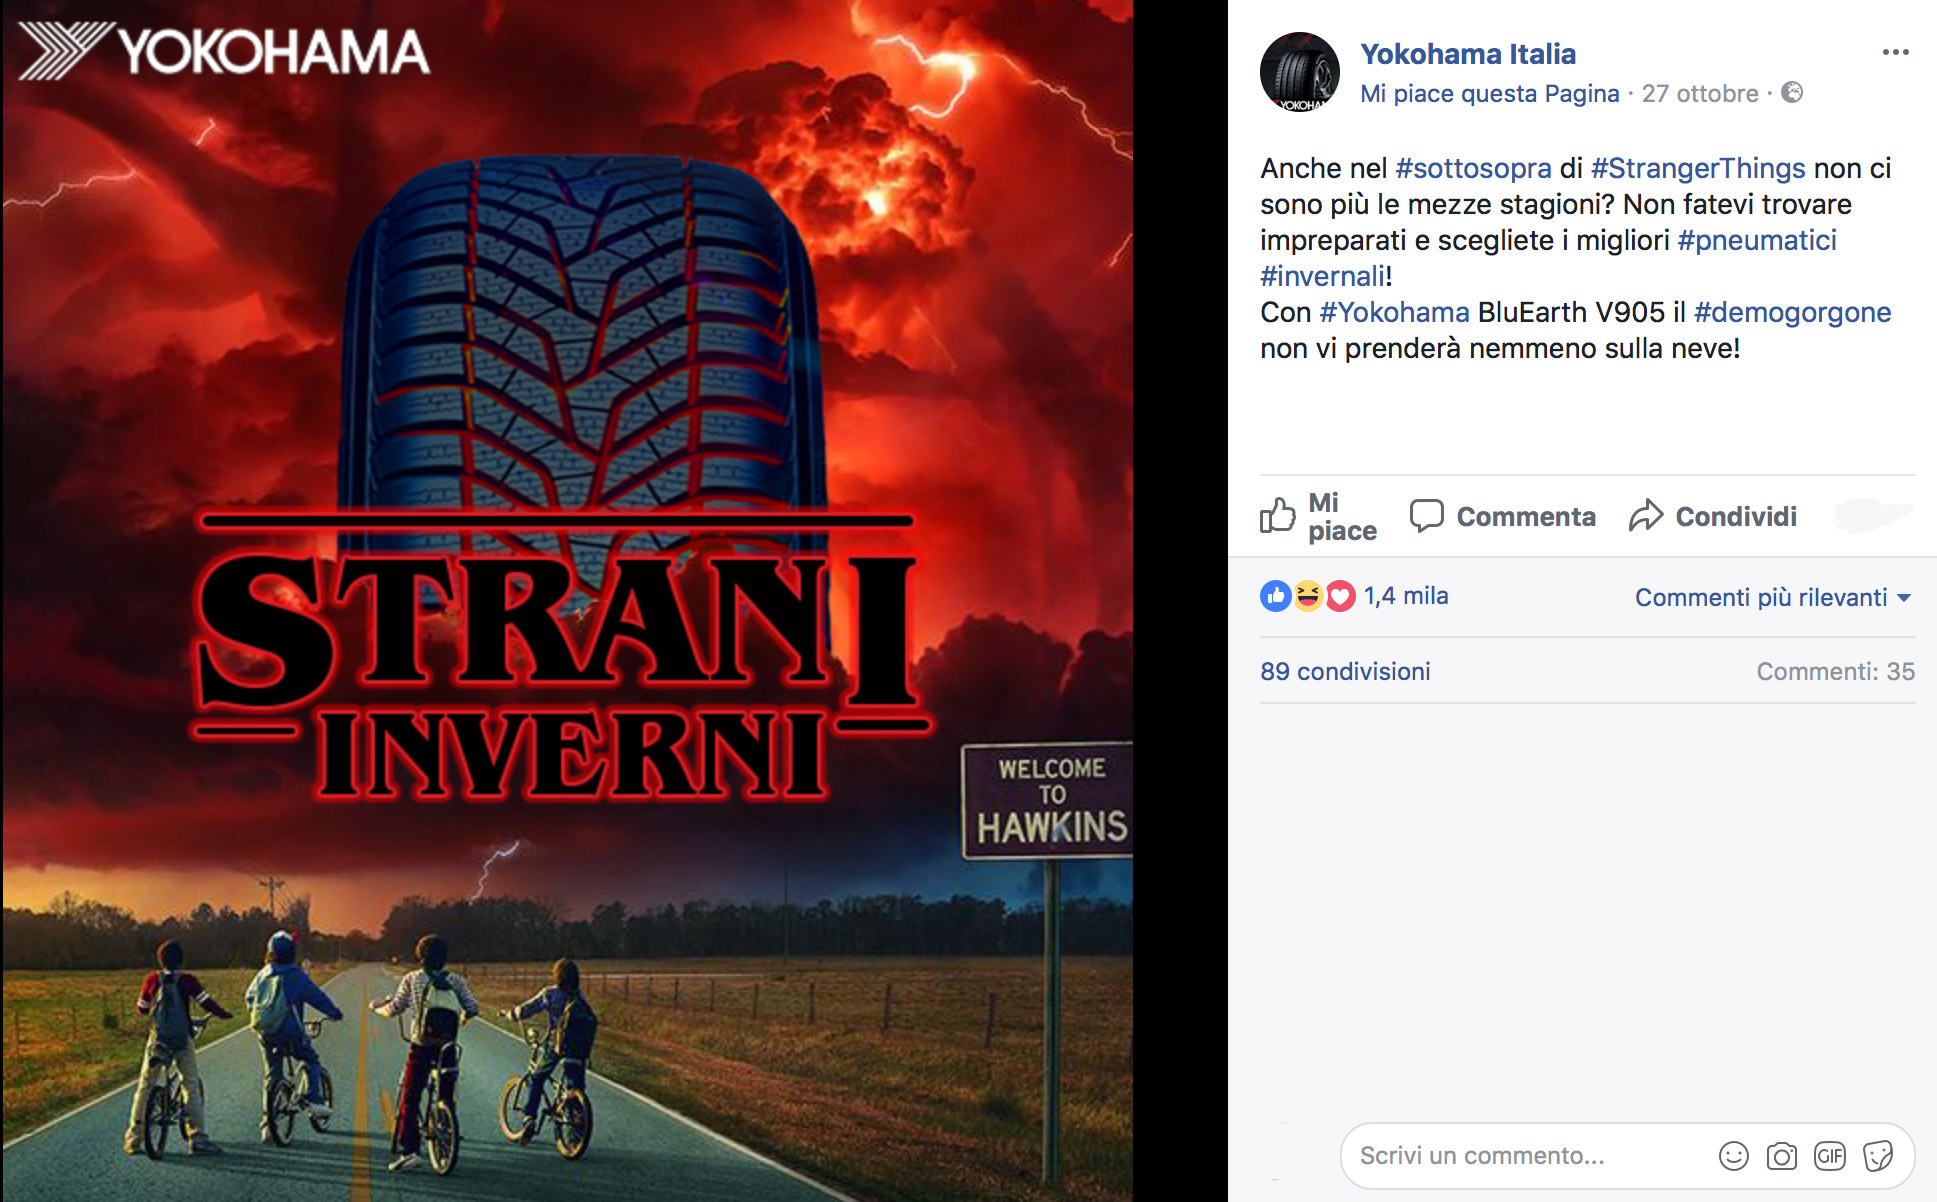 social network - Yokohama Italia per Stranger Things 2